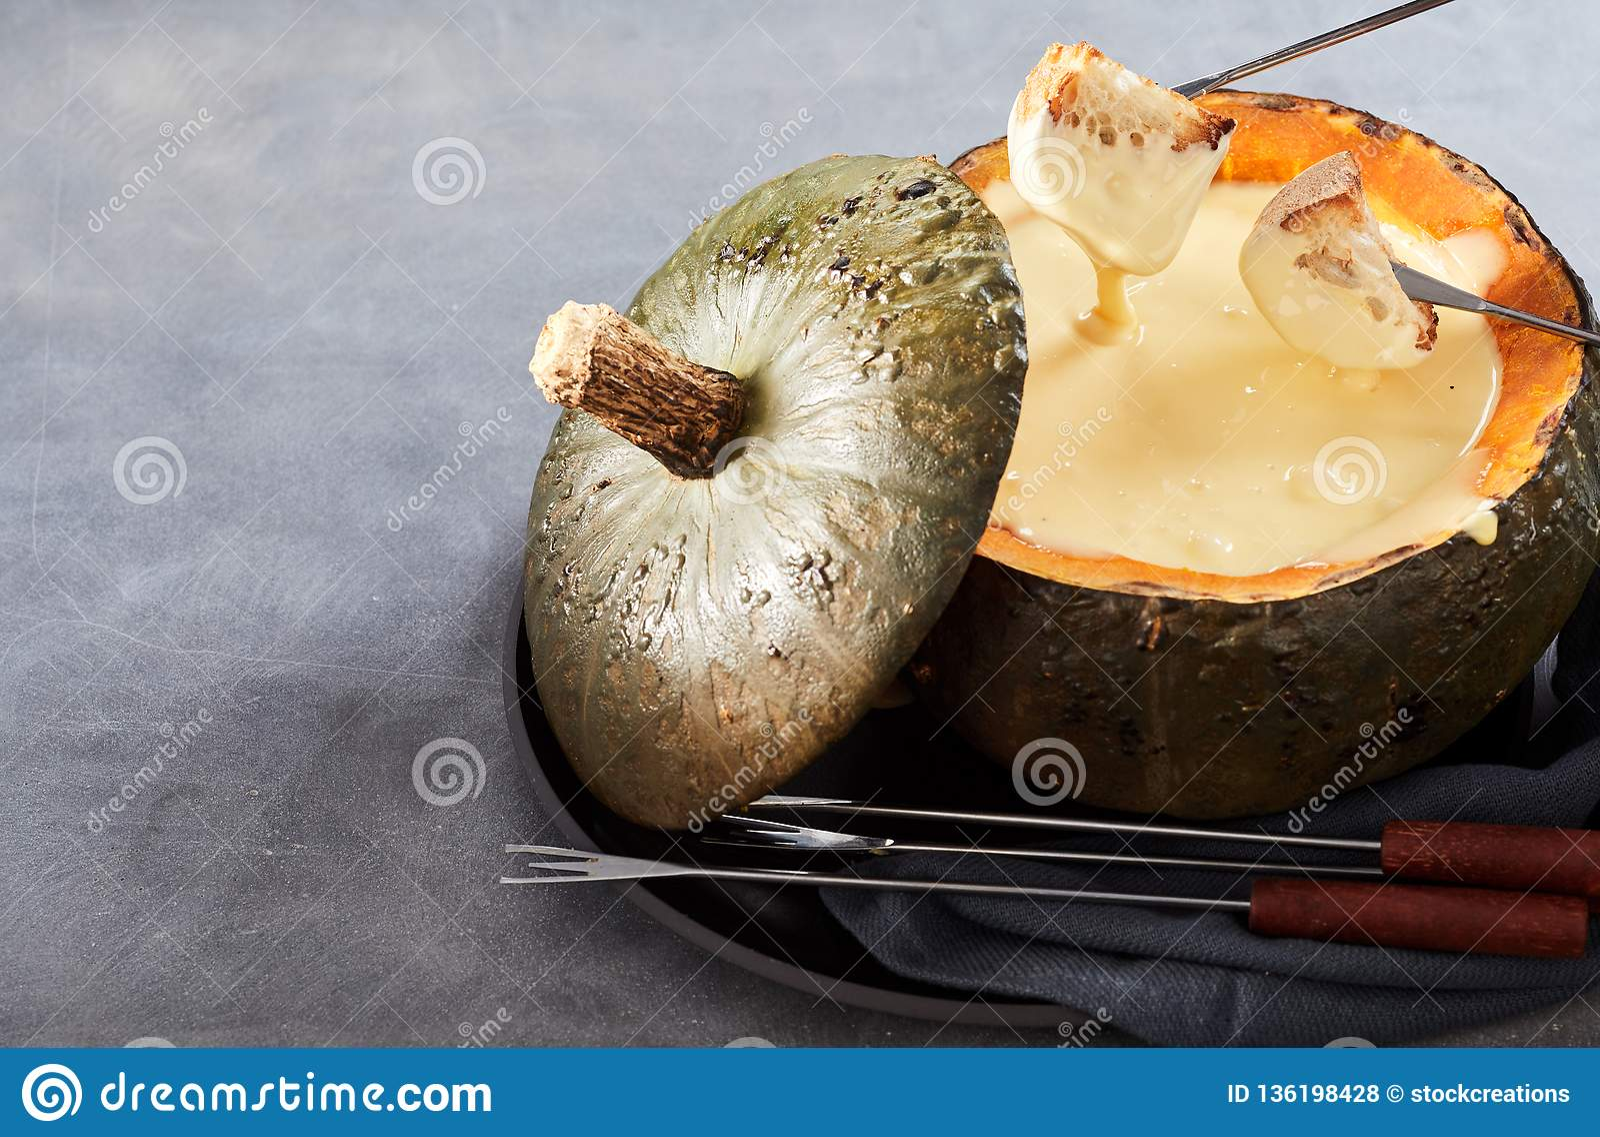 Creamy cheese fondue for entertaining